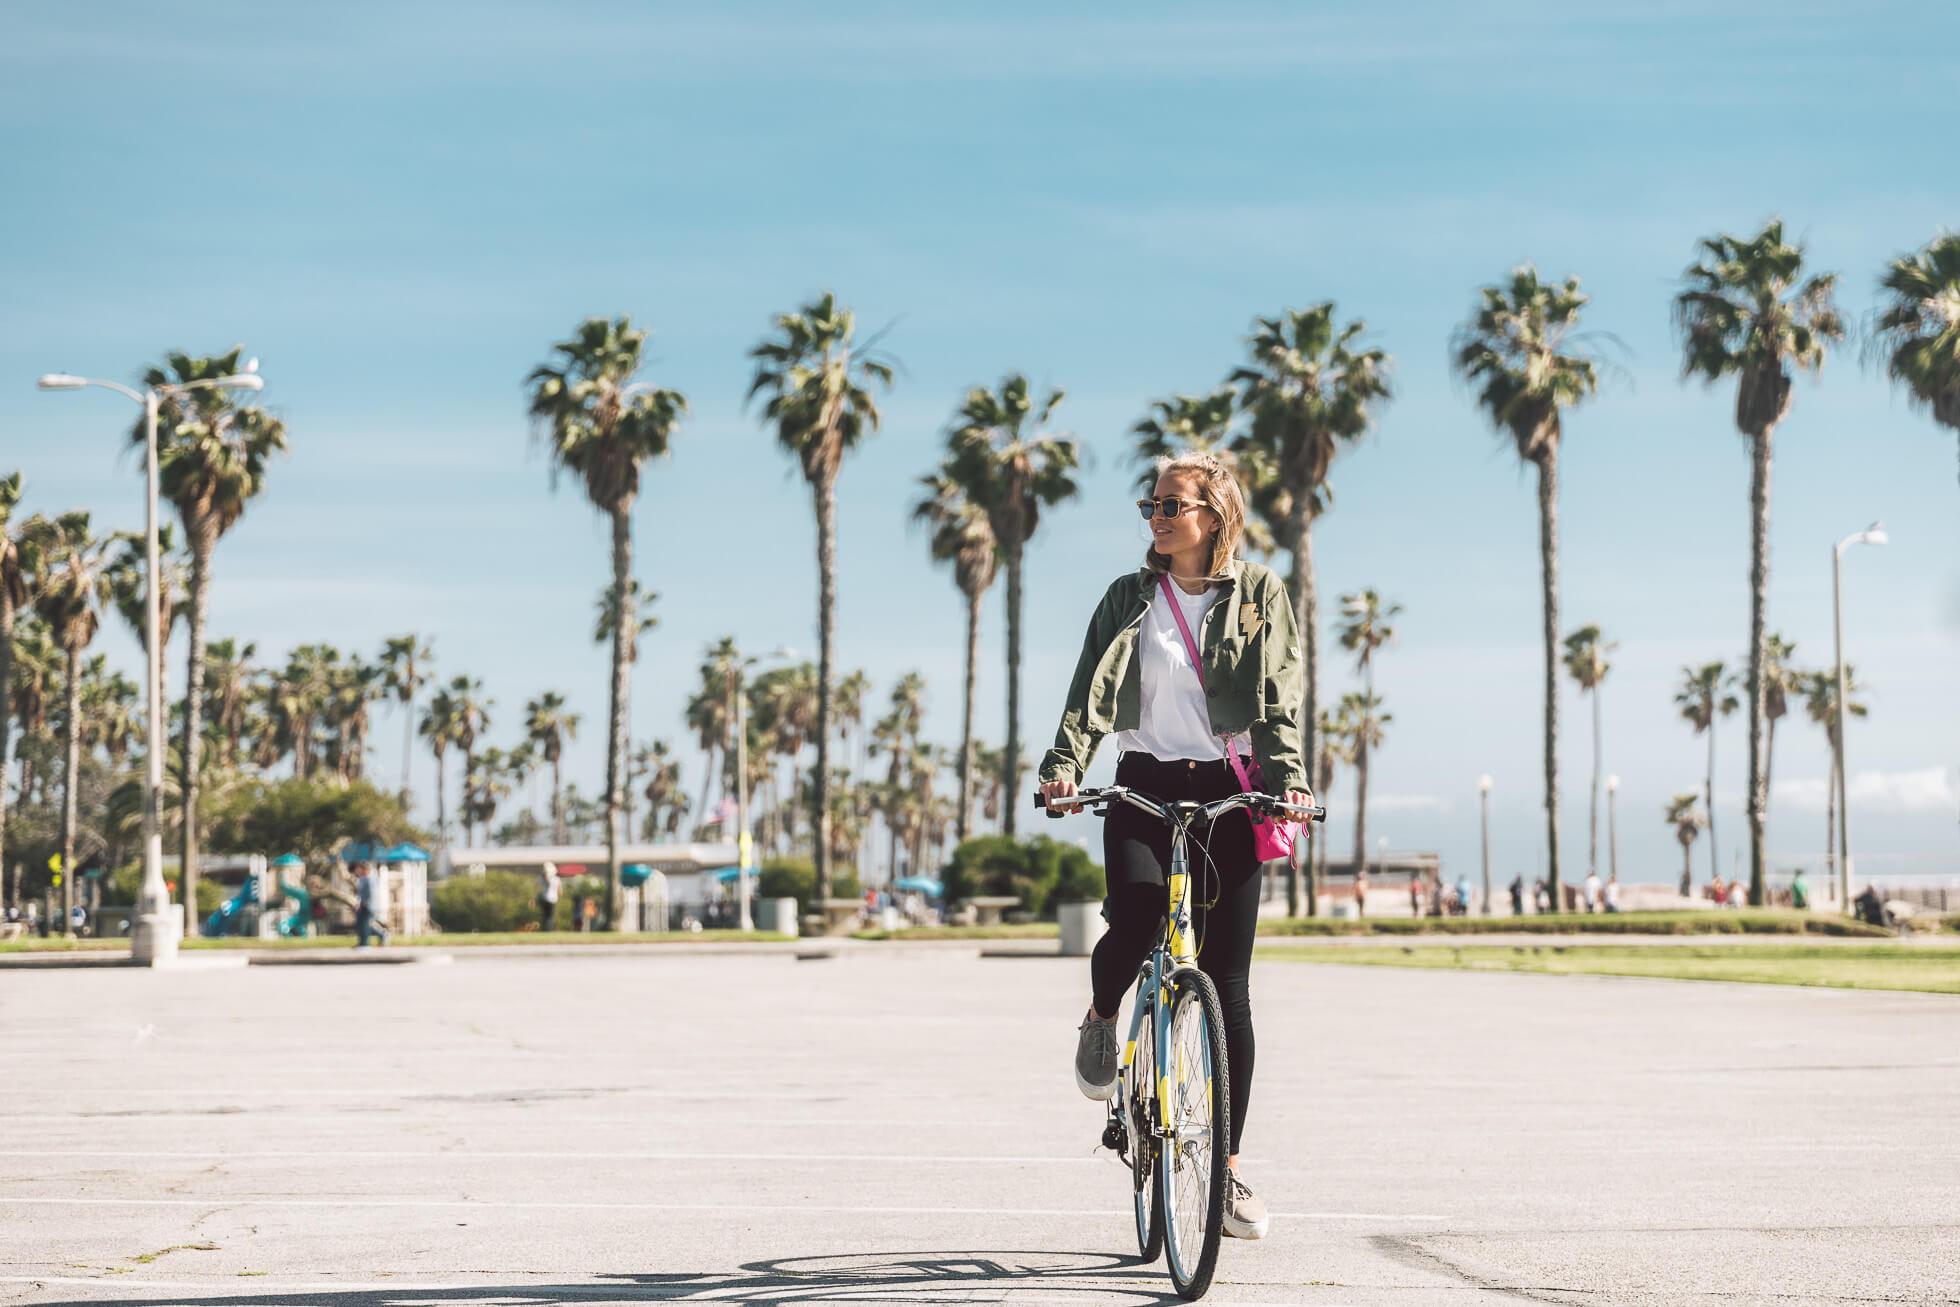 janni-deler-bike-ride-veniceL1010439